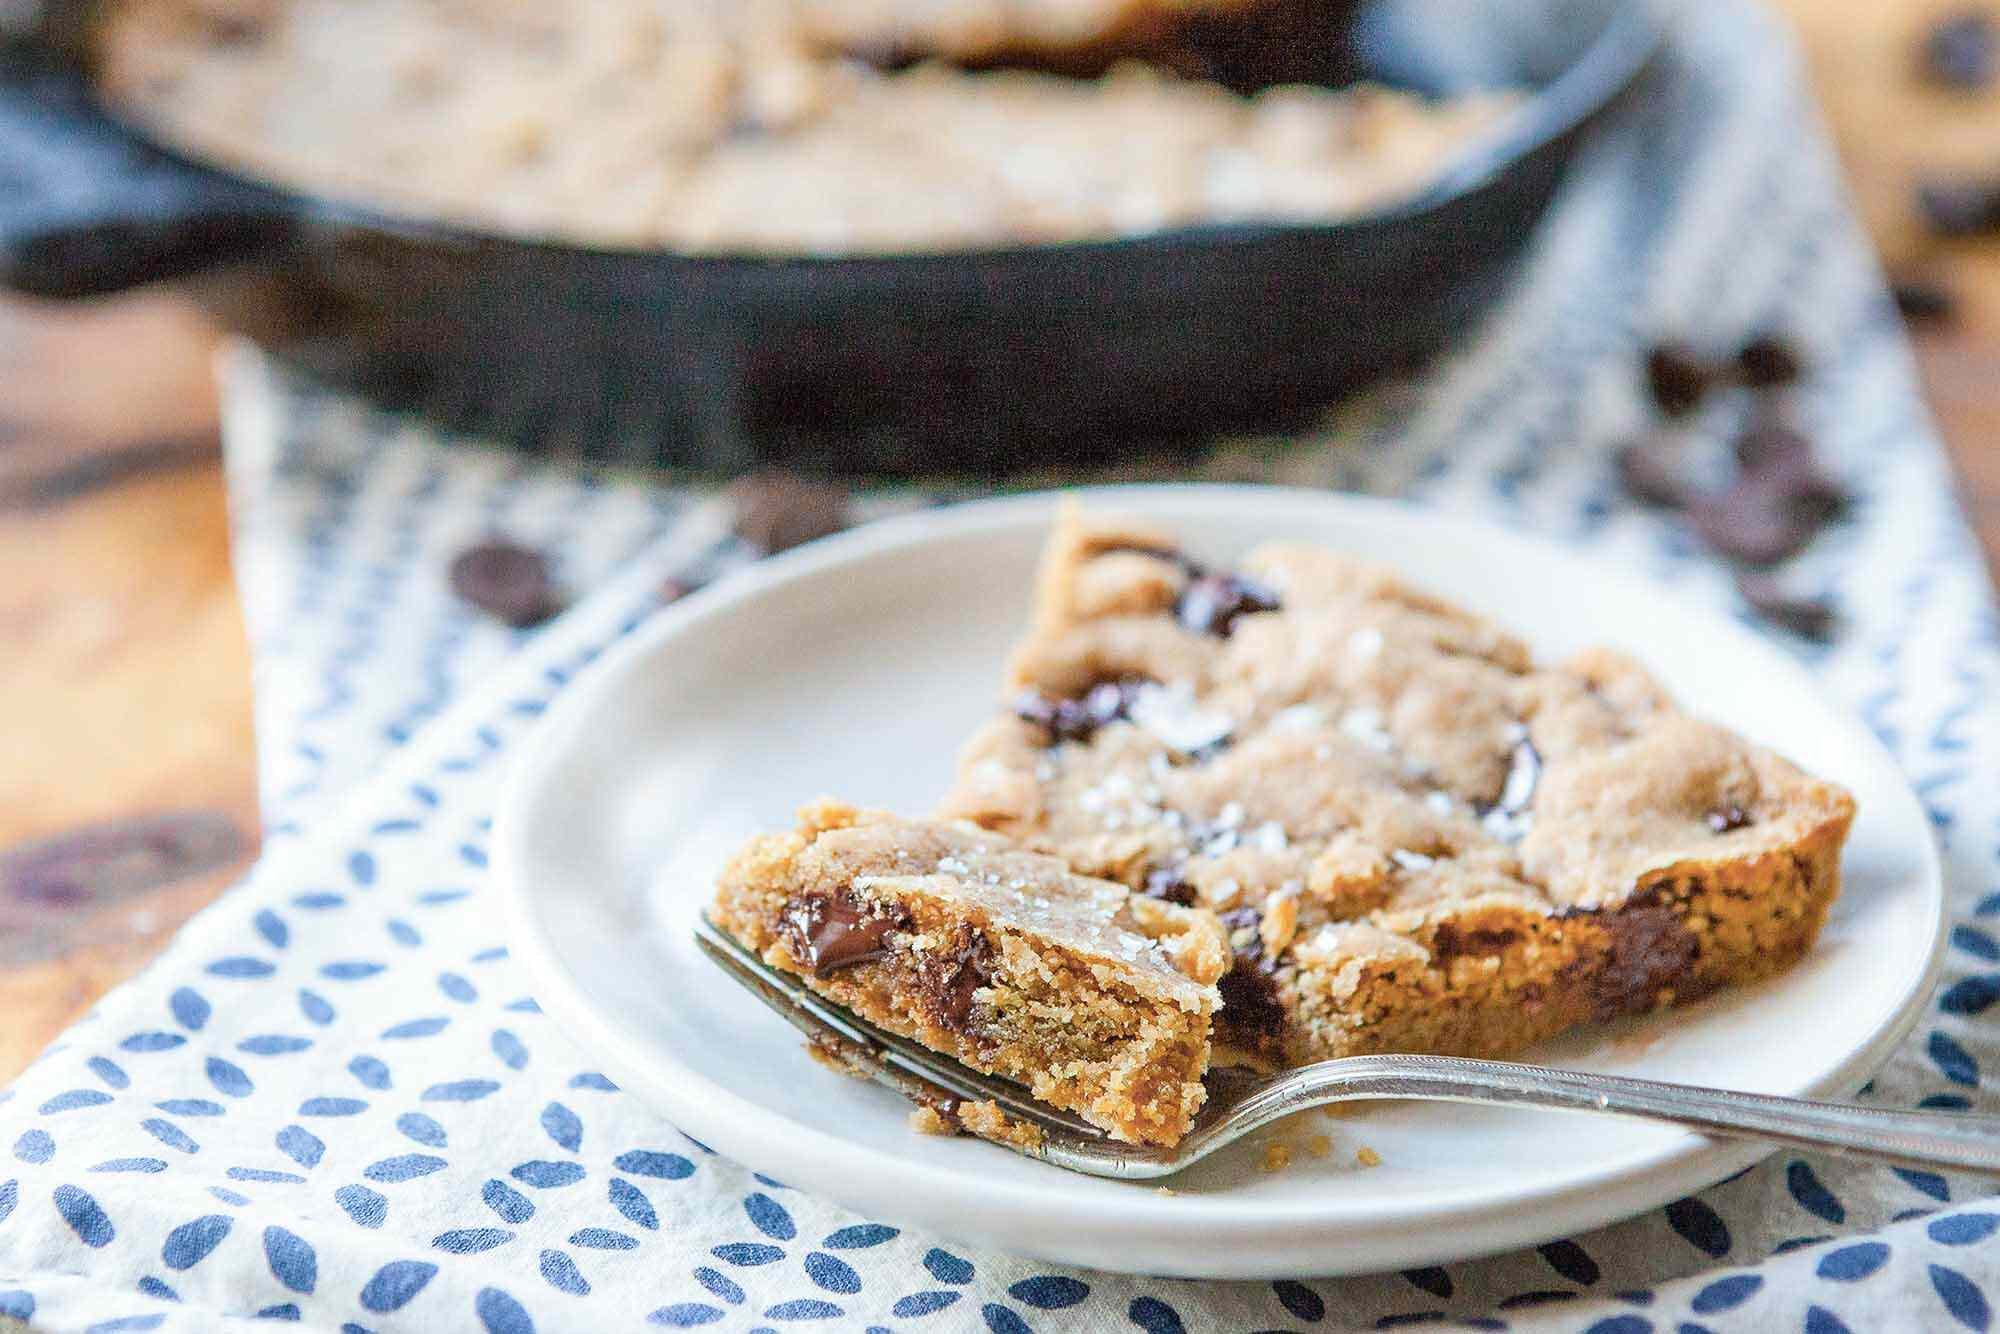 Cast Iron Skillet Chocolate Chip Cookie Recipe